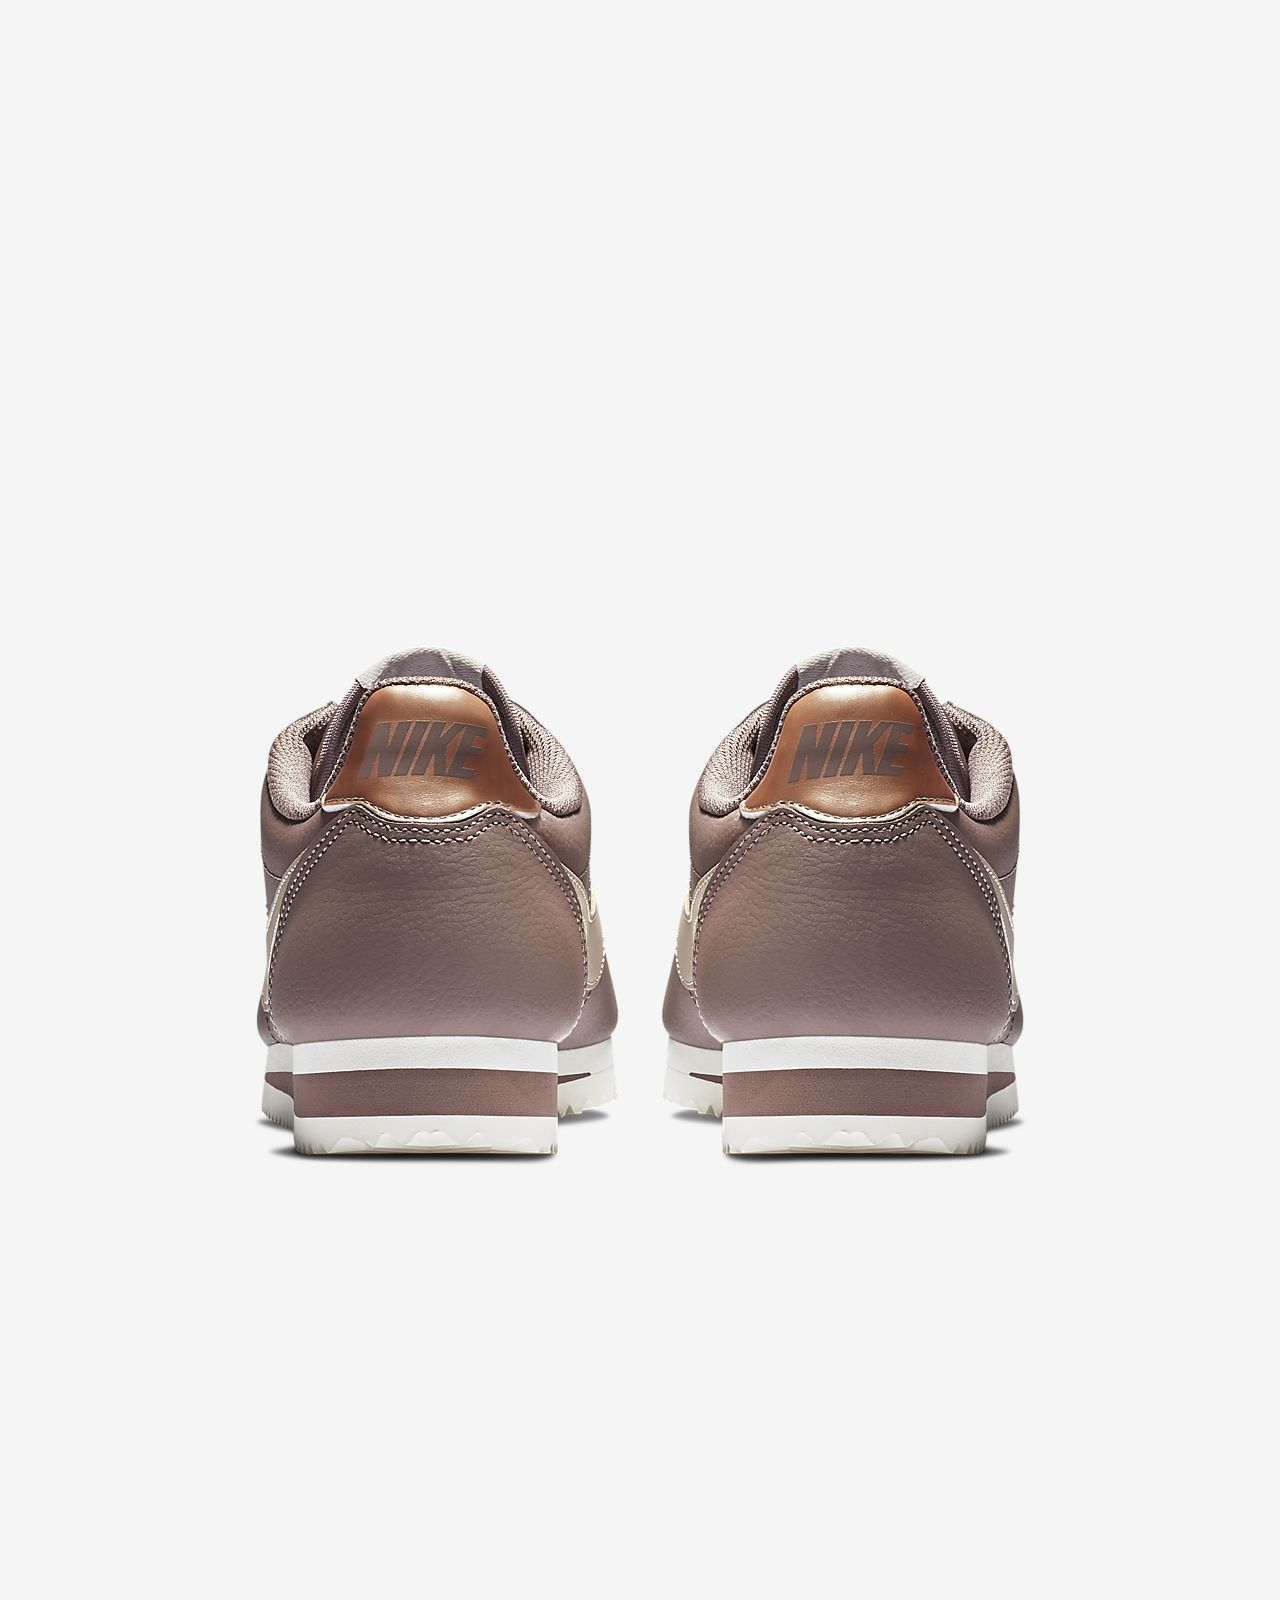 207d154aafd Nike Classic Cortez Leather Women s Shoe. Nike.com ID